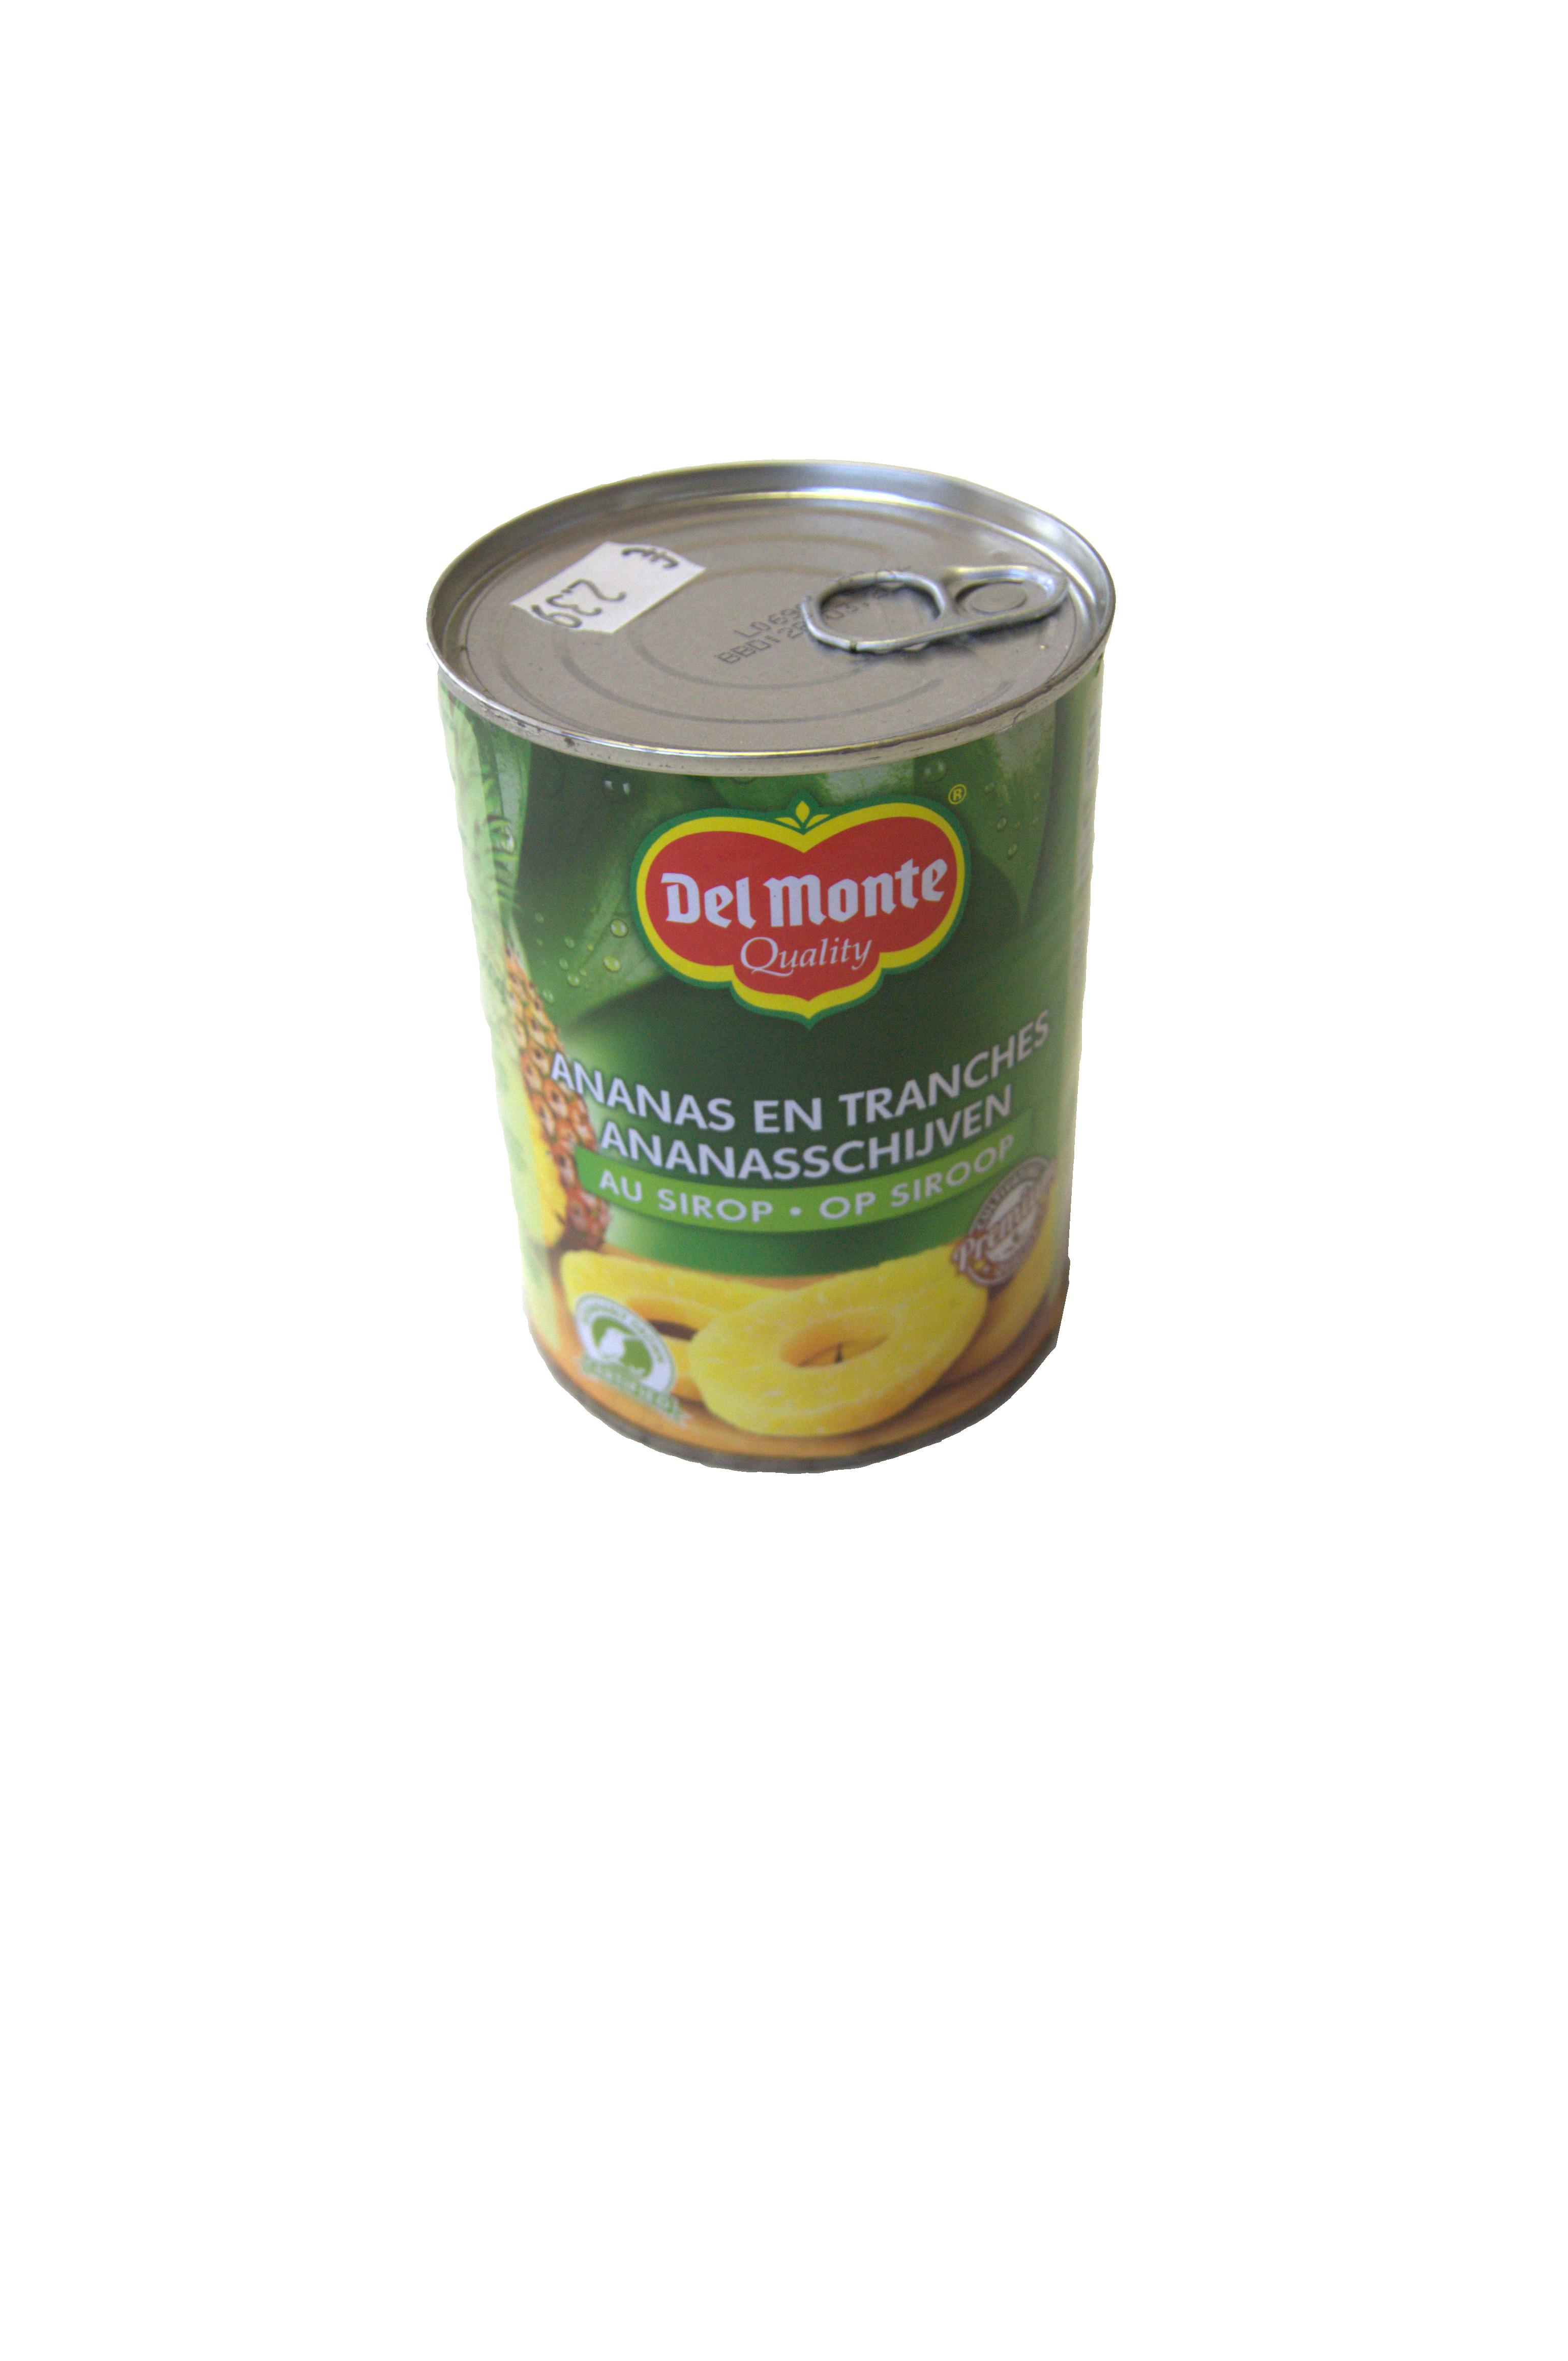 ananas schijf op siroop delmonte 570g